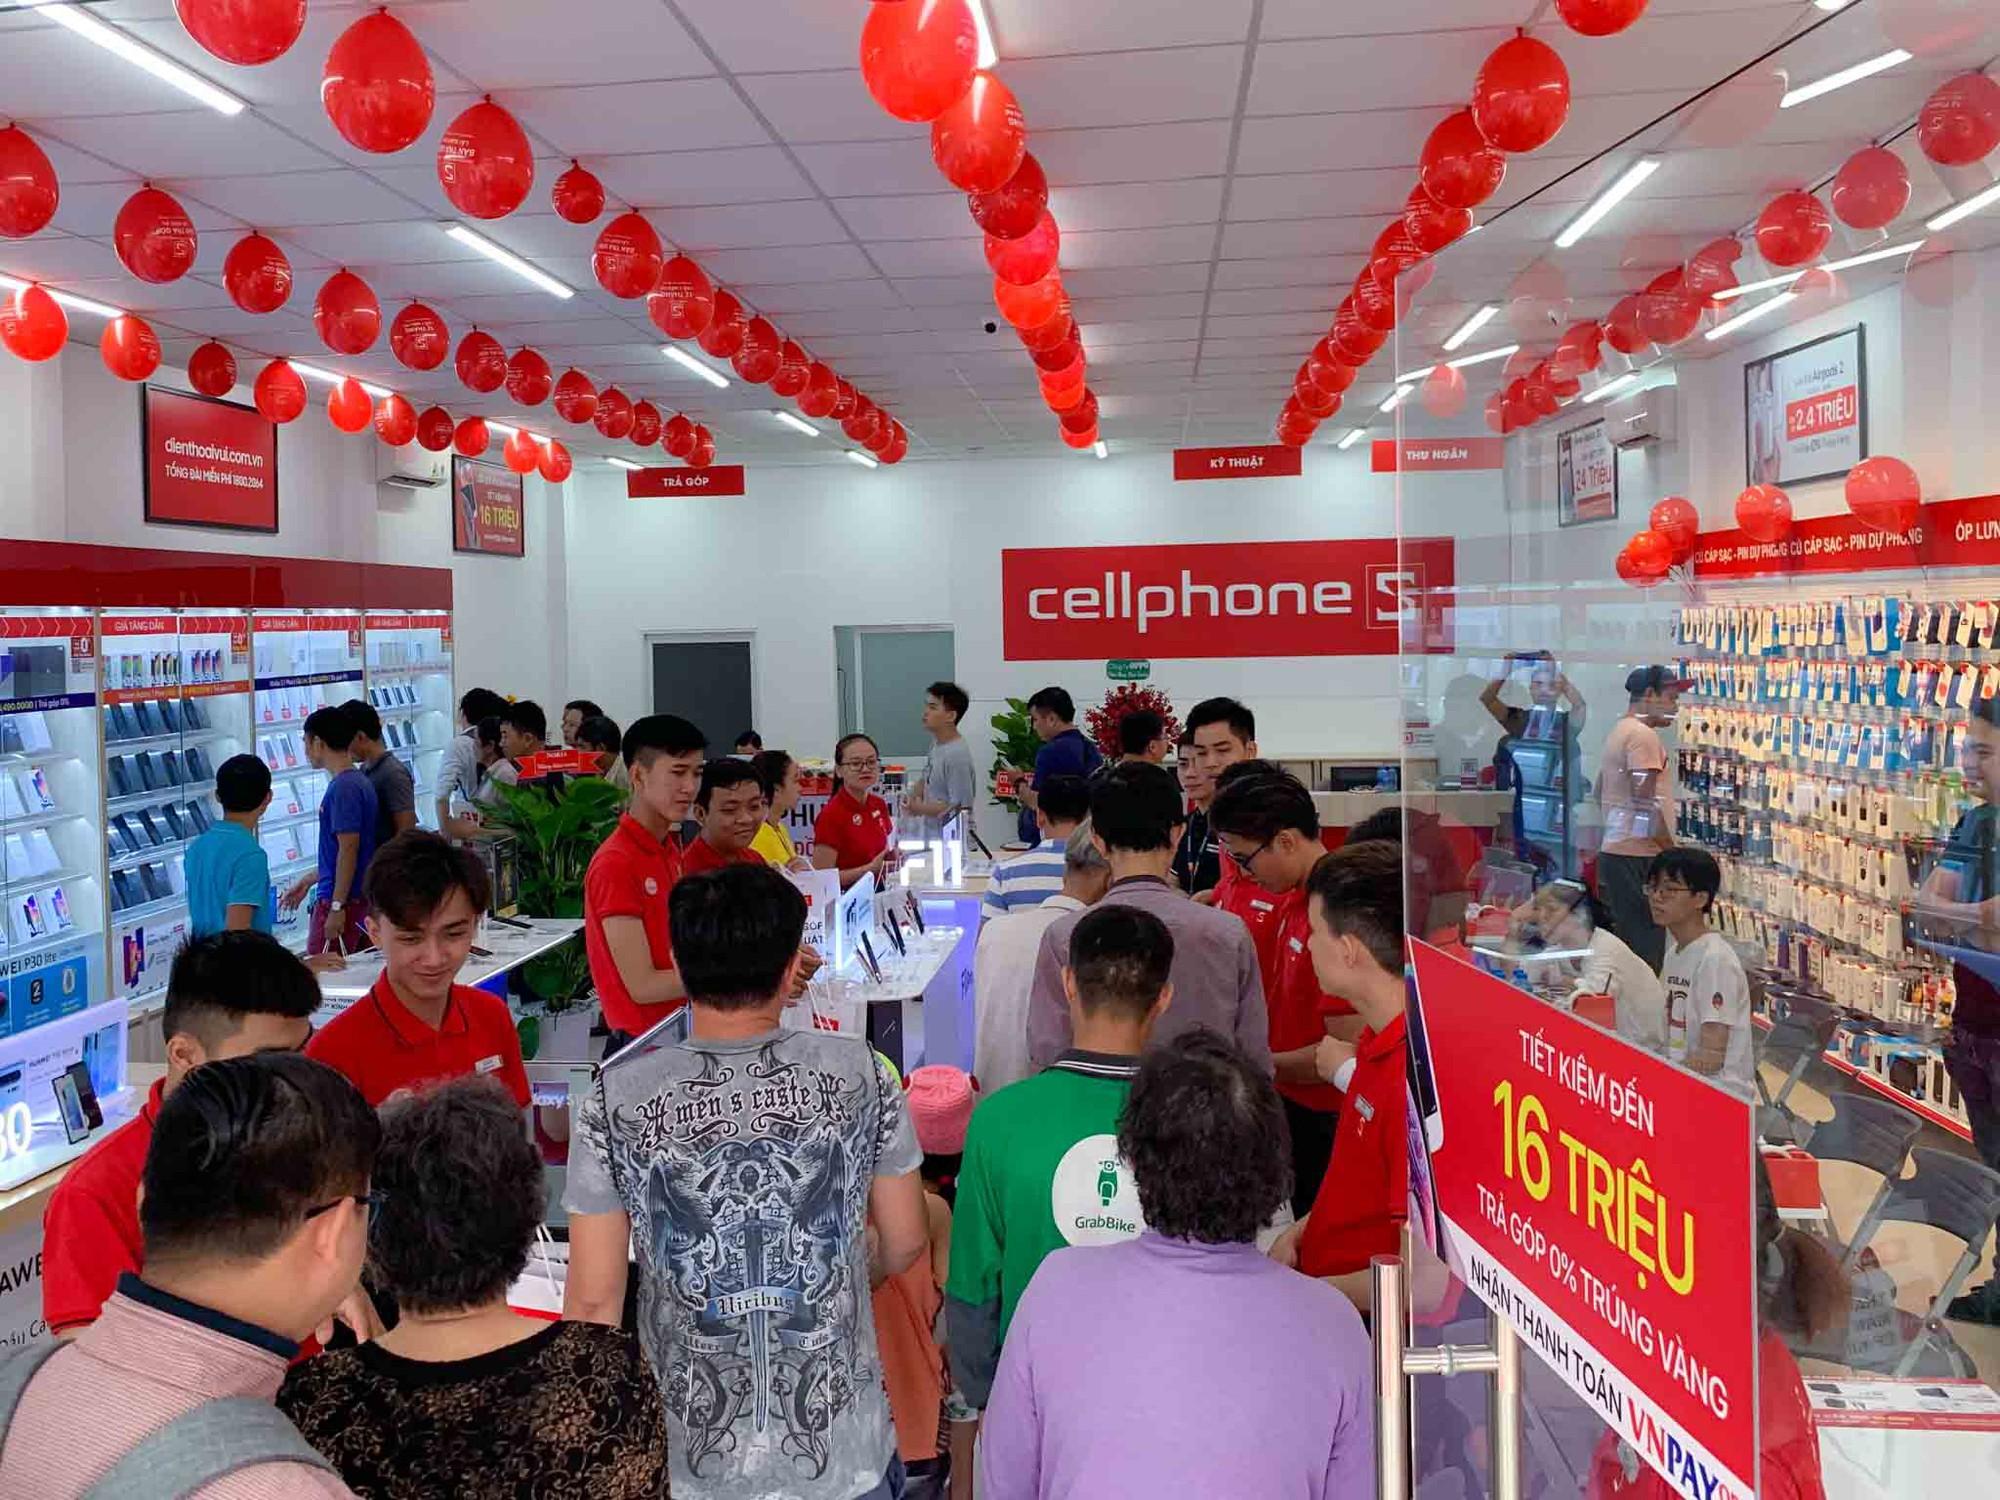 Dien-thoai-giam-gia-thang-10-iPhone-hut-hang-Samsung-tut-sau 1